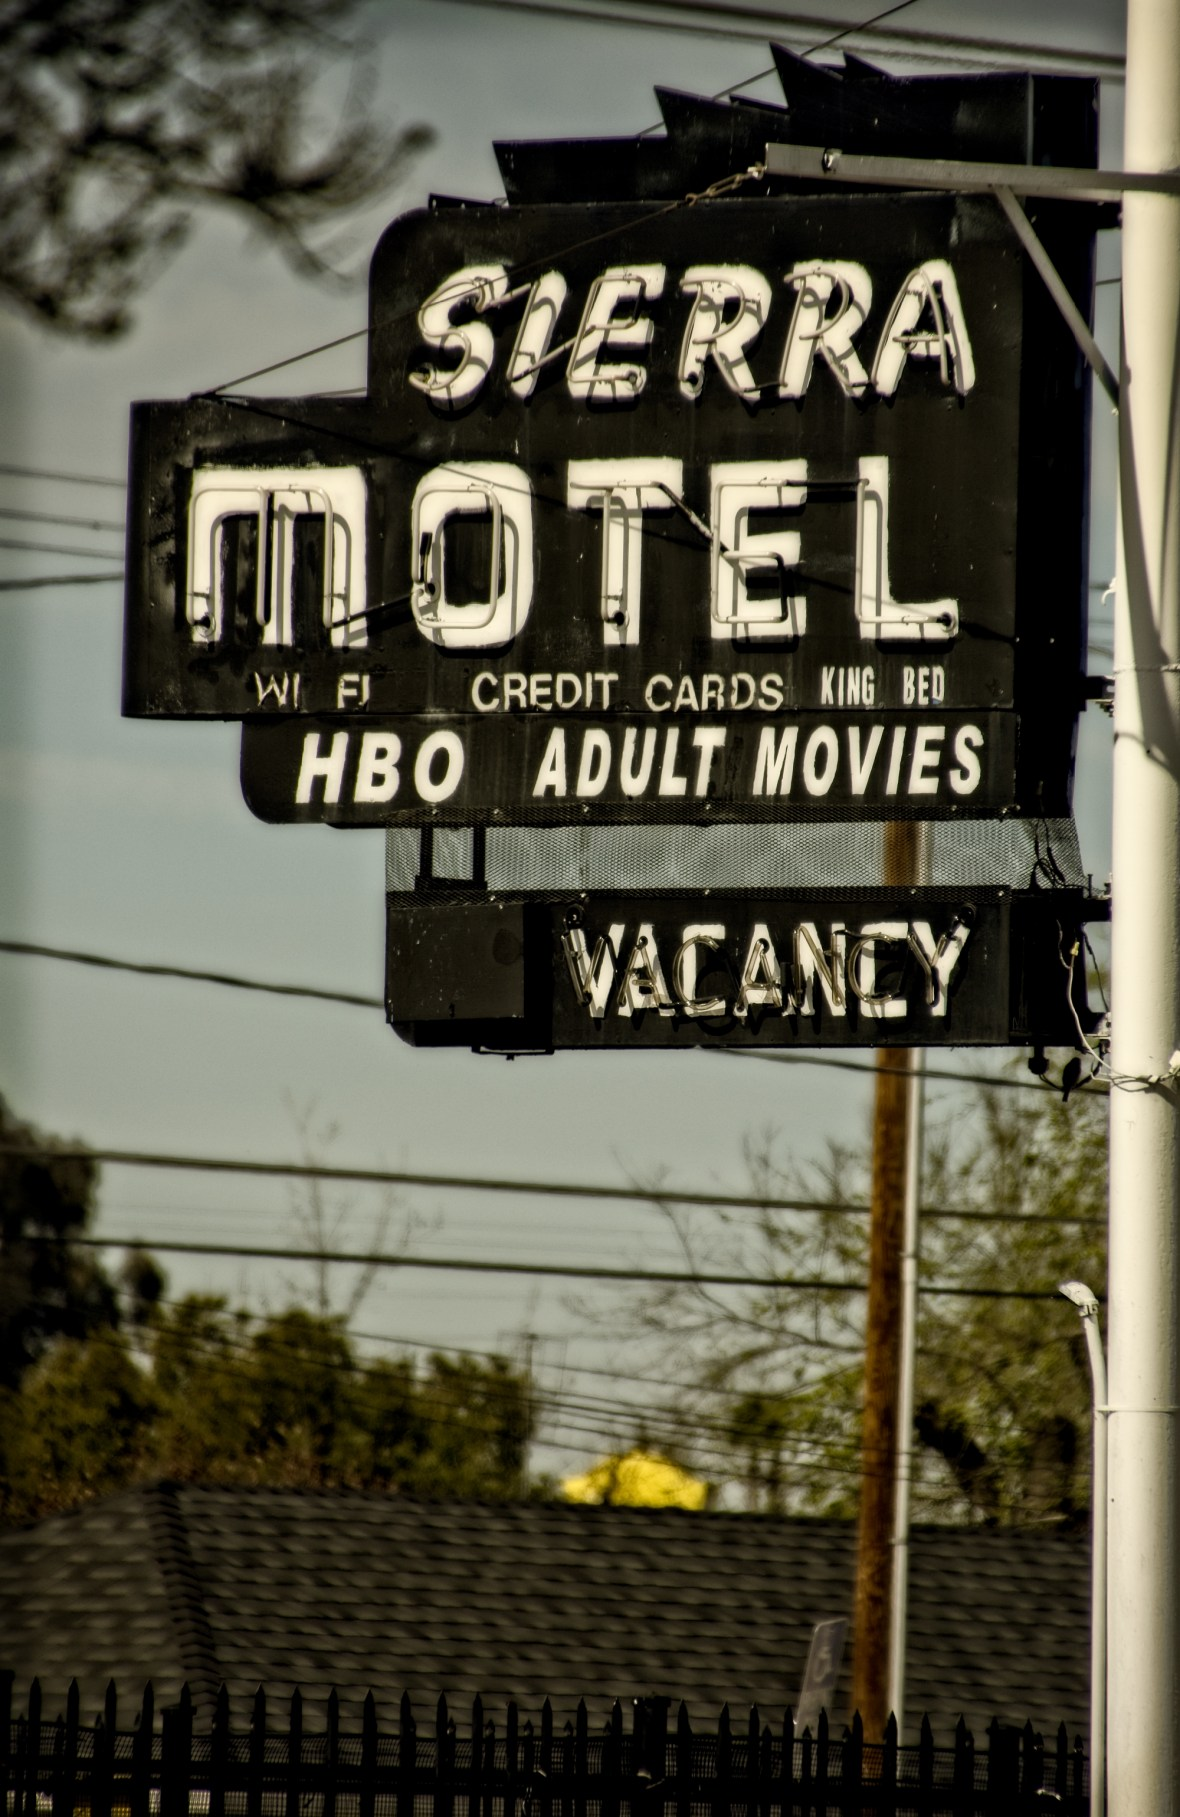 Sierra Motel - 2255 Whitson Street, Selma, California U.S.A. - March 8, 2018